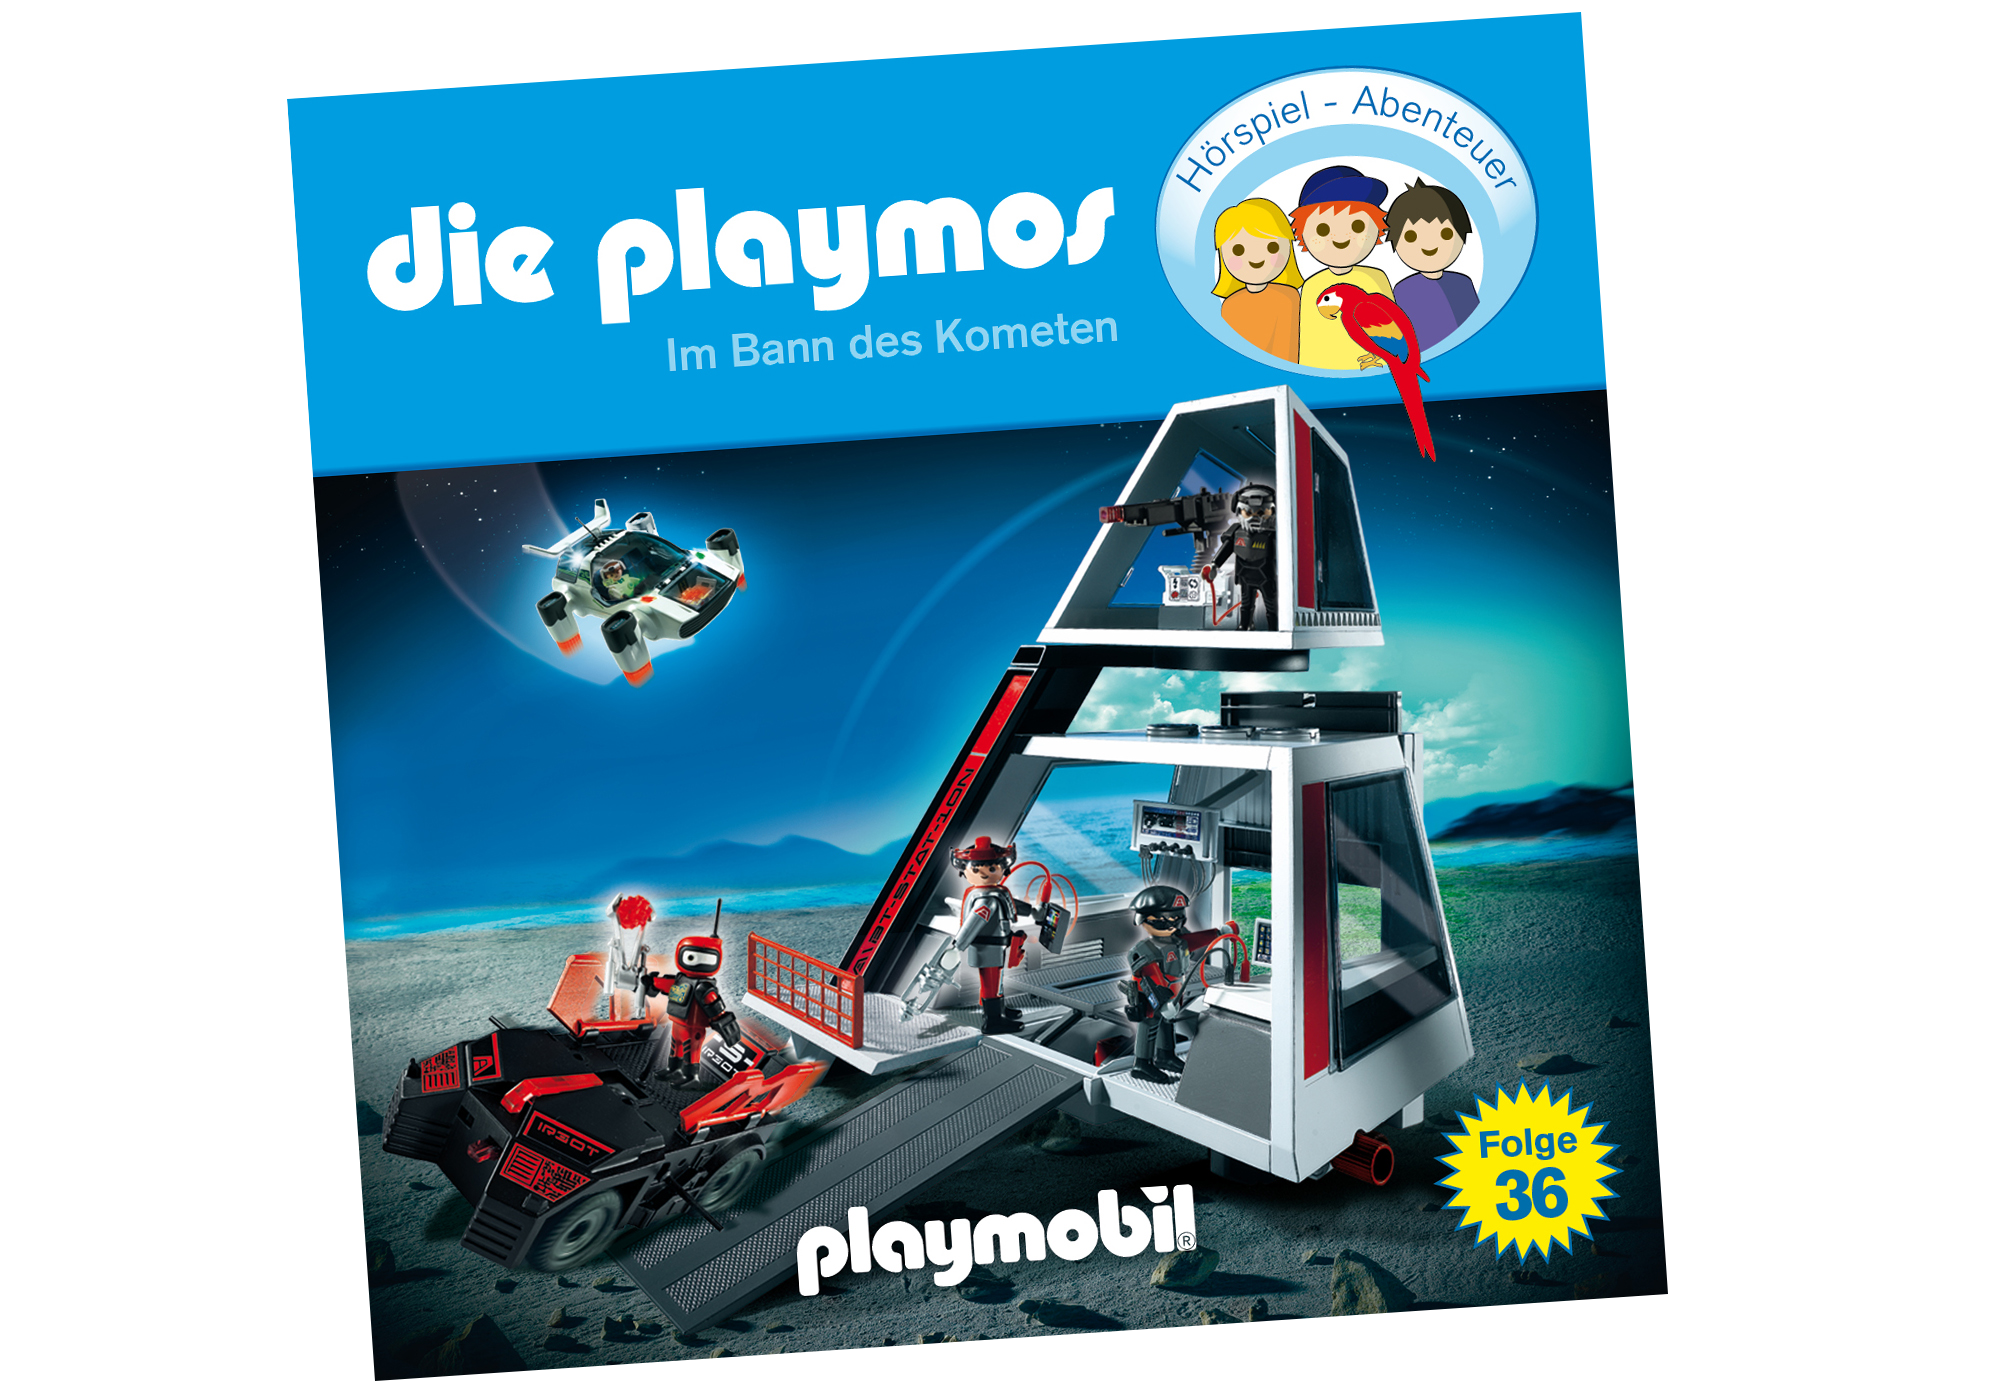 http://media.playmobil.com/i/playmobil/80447_product_detail/Im Bann des Kometen (36) - CD